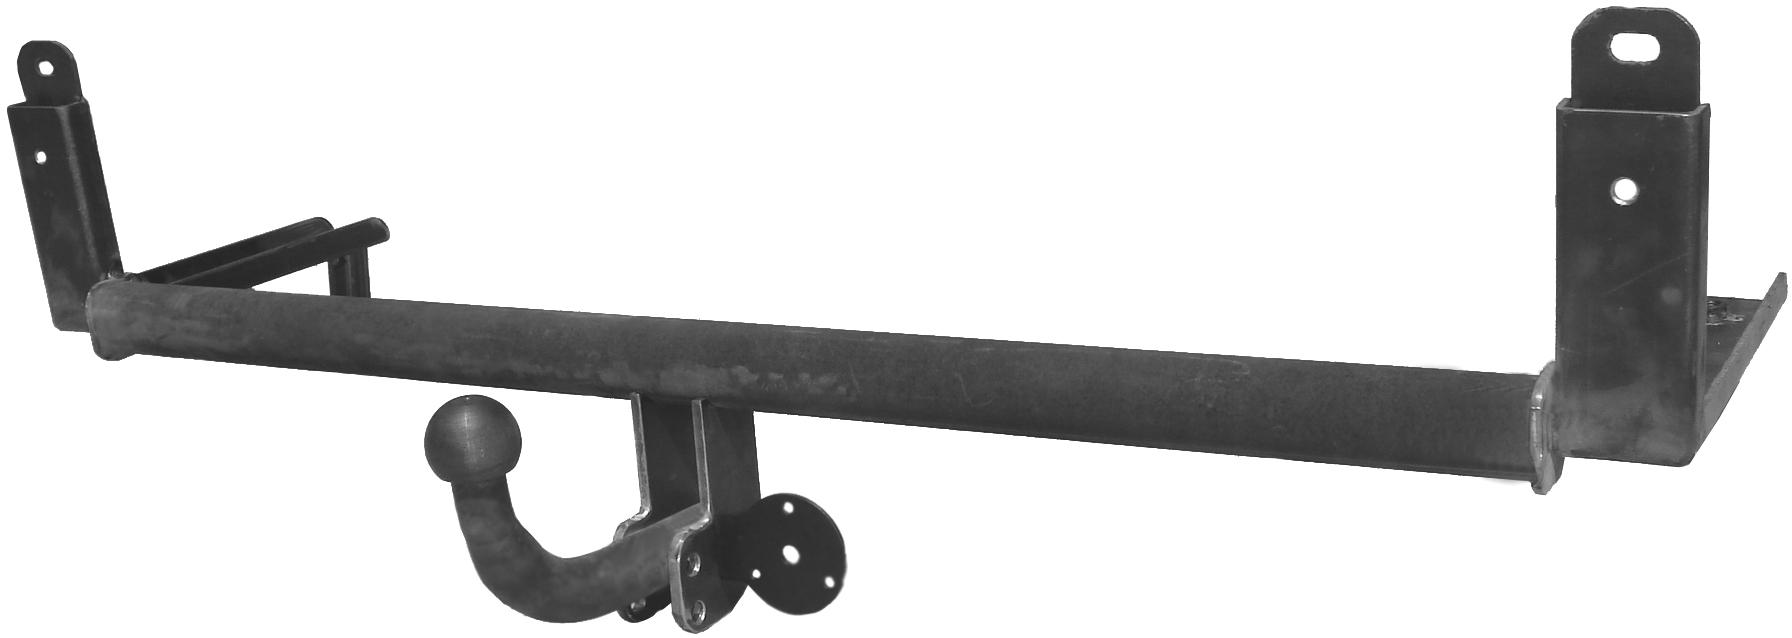 Установка фаркопа своими руками на чери амулет